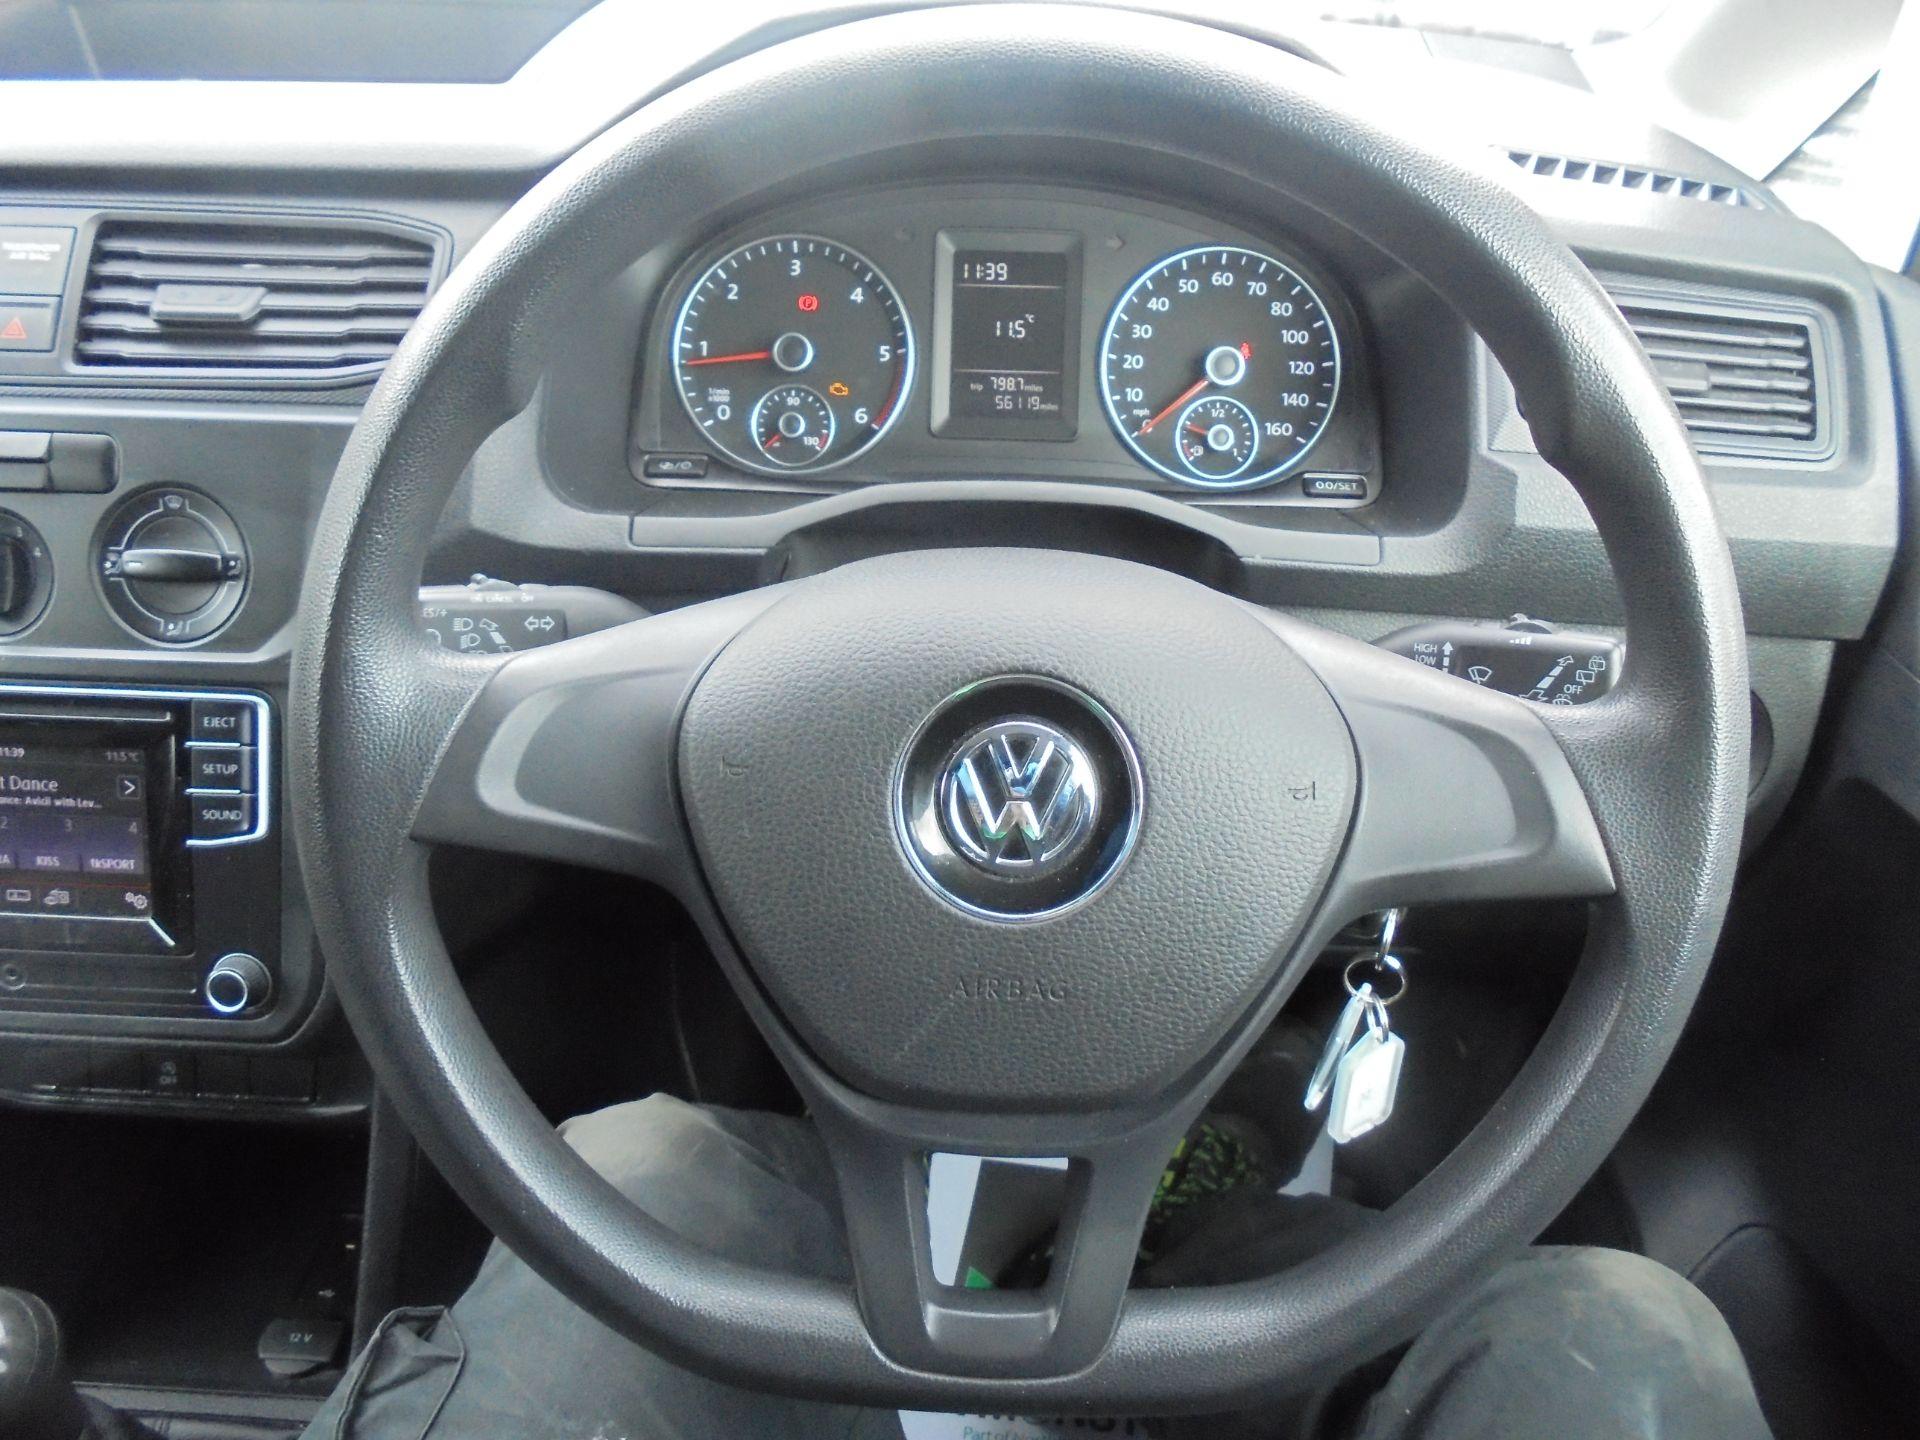 2016 Volkswagen Caddy 1.6 TDI BLUEMOTION TECH 75PS EURO 5 (GF66BZK) Image 15